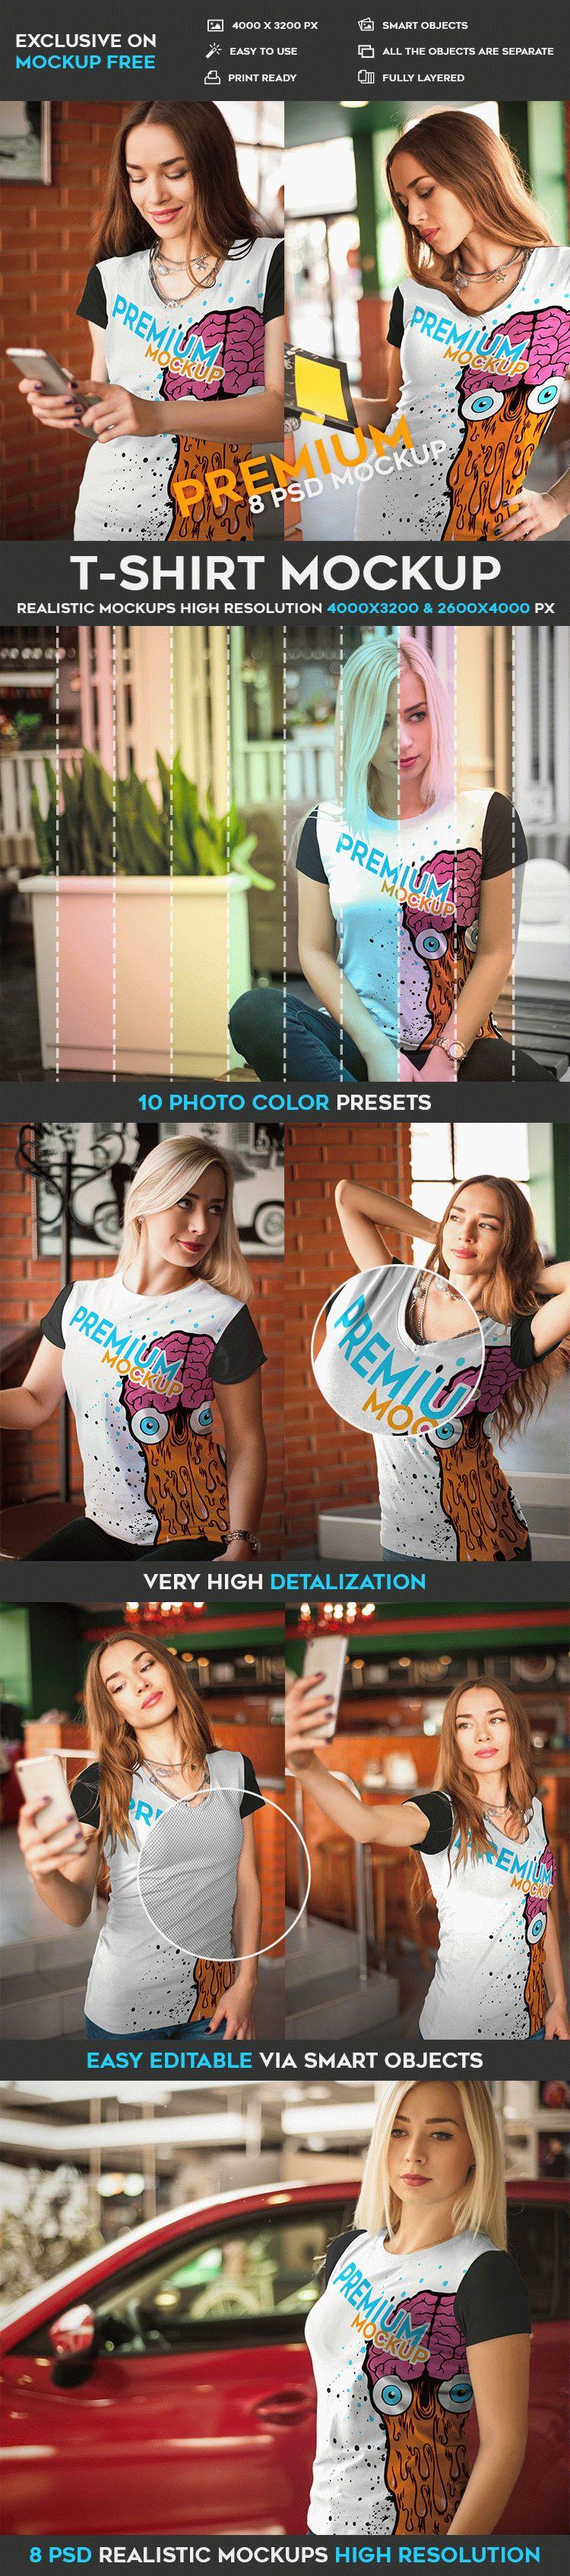 bigpreview_t-shirt-8-premium-psd-mockups